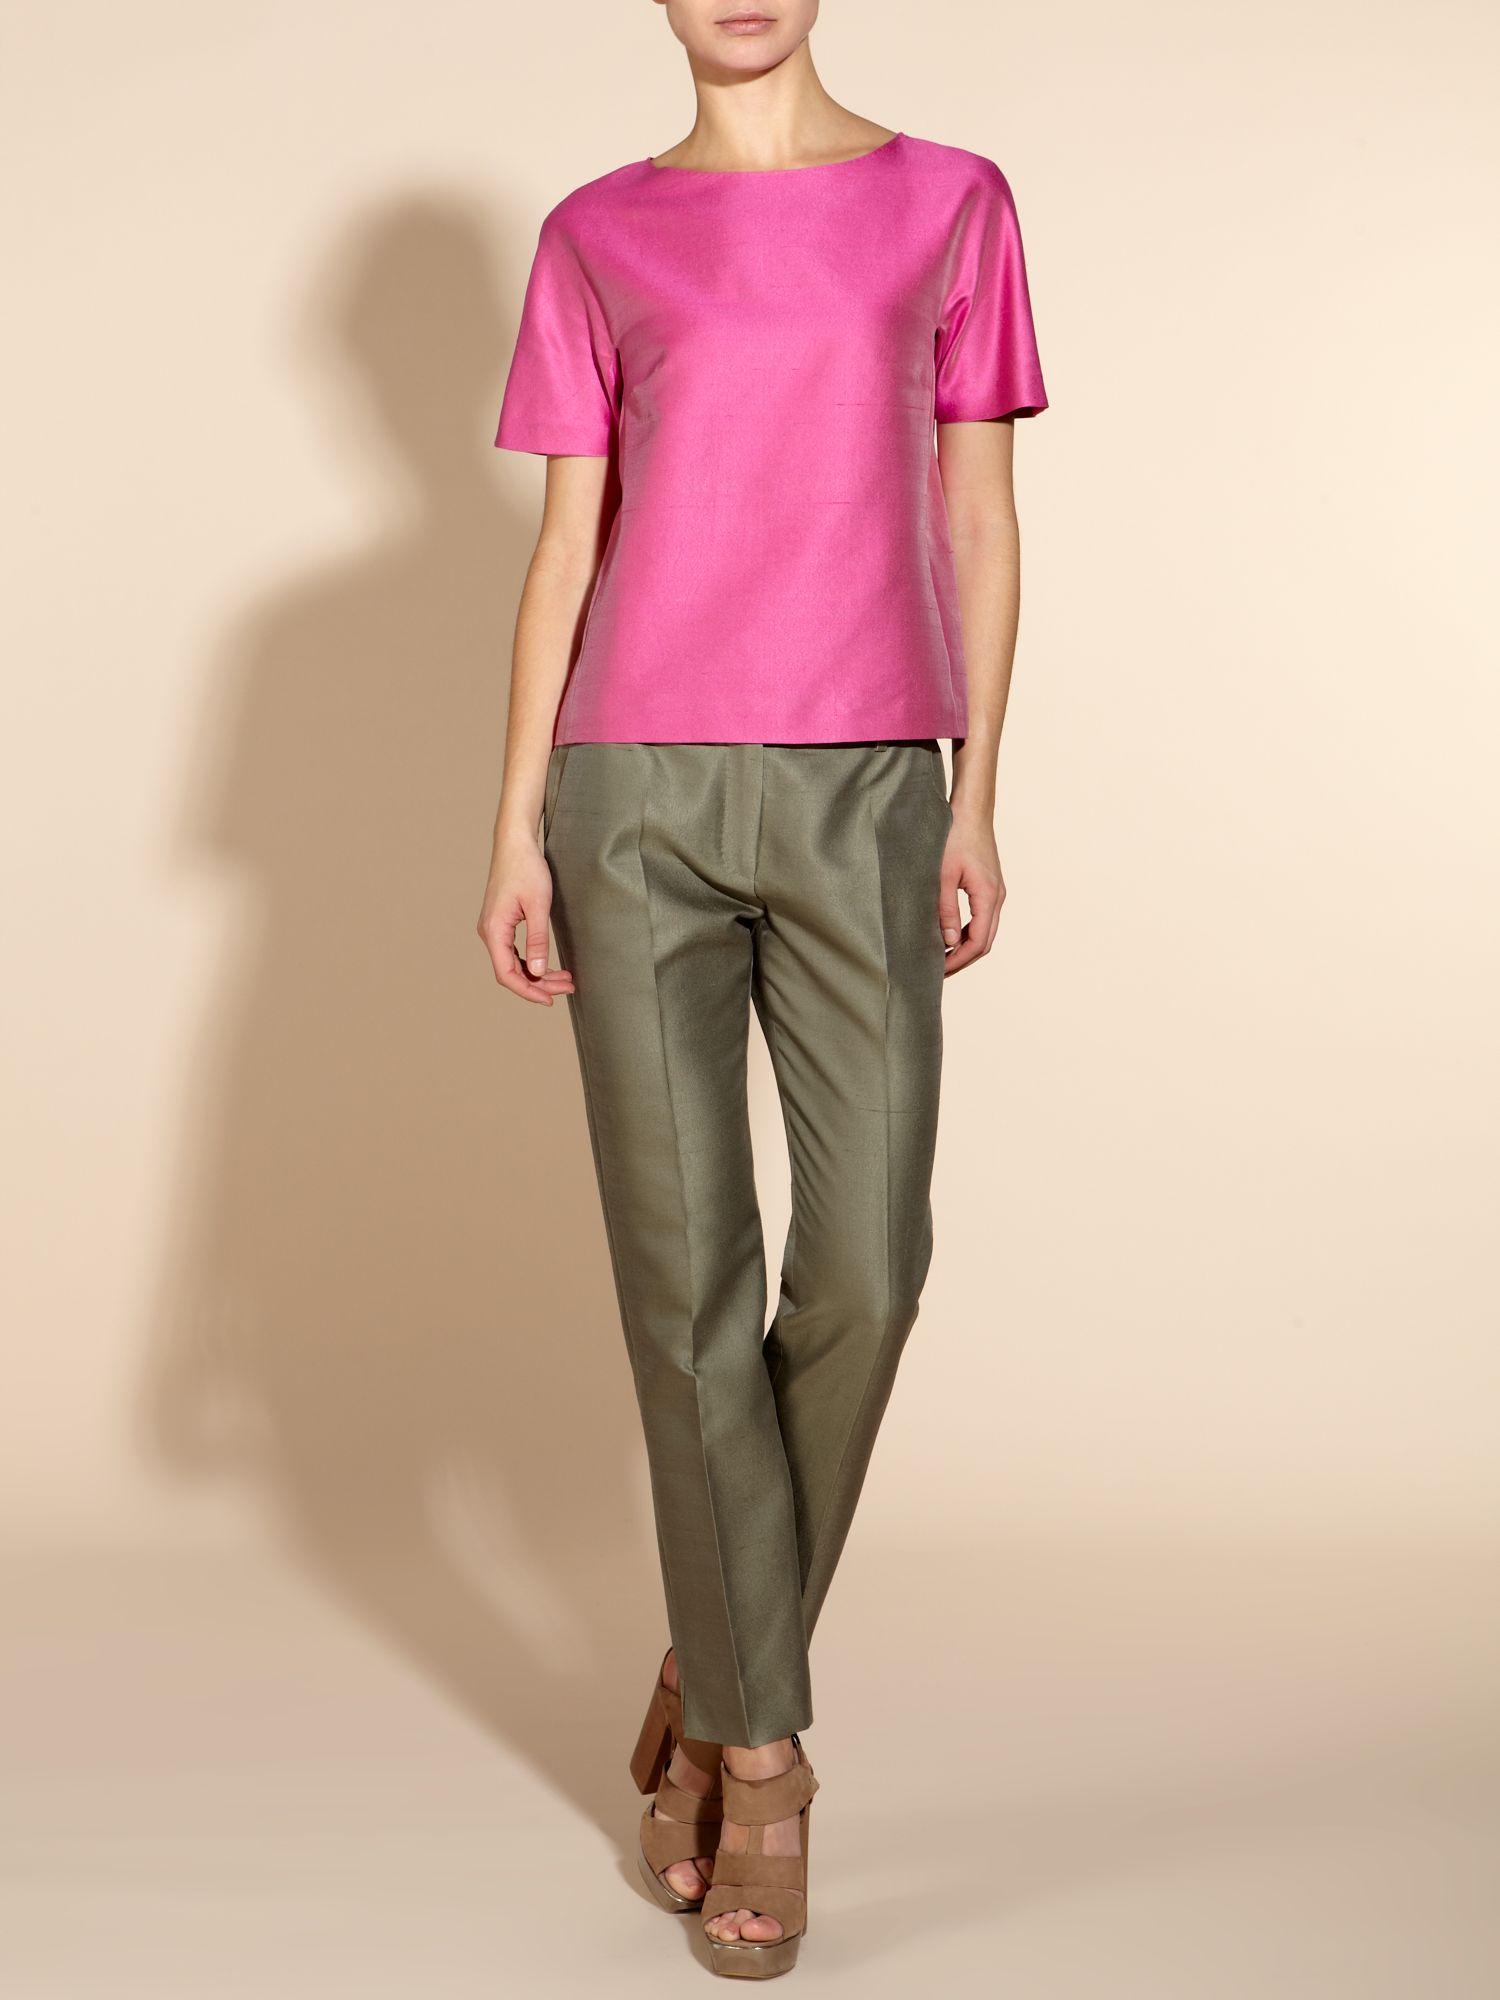 max-mara-studio-khaki-juanita-cotton-silk-mix-cropped-trousers-product-2-11579223-191825805